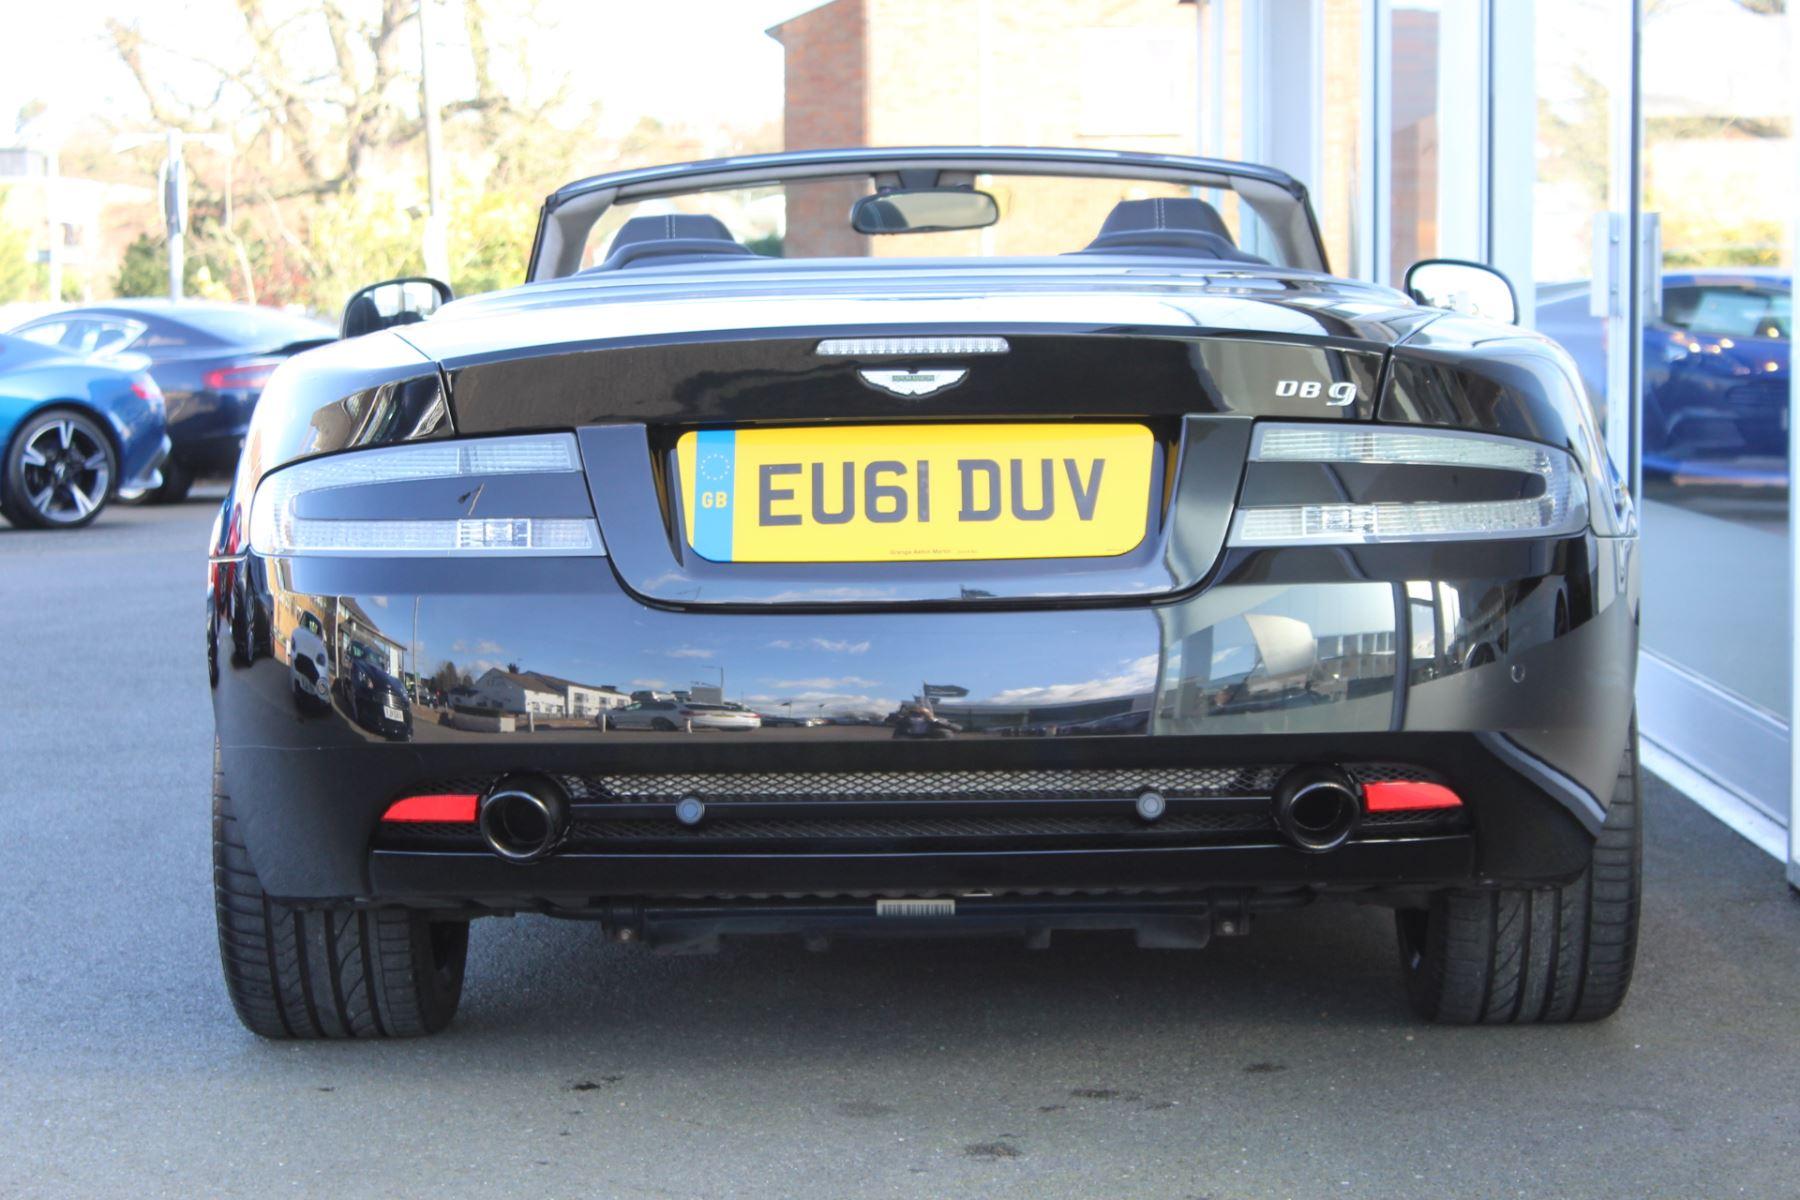 Aston Martin DB9 V12 2dr Volante Touchtronic [470] image 22